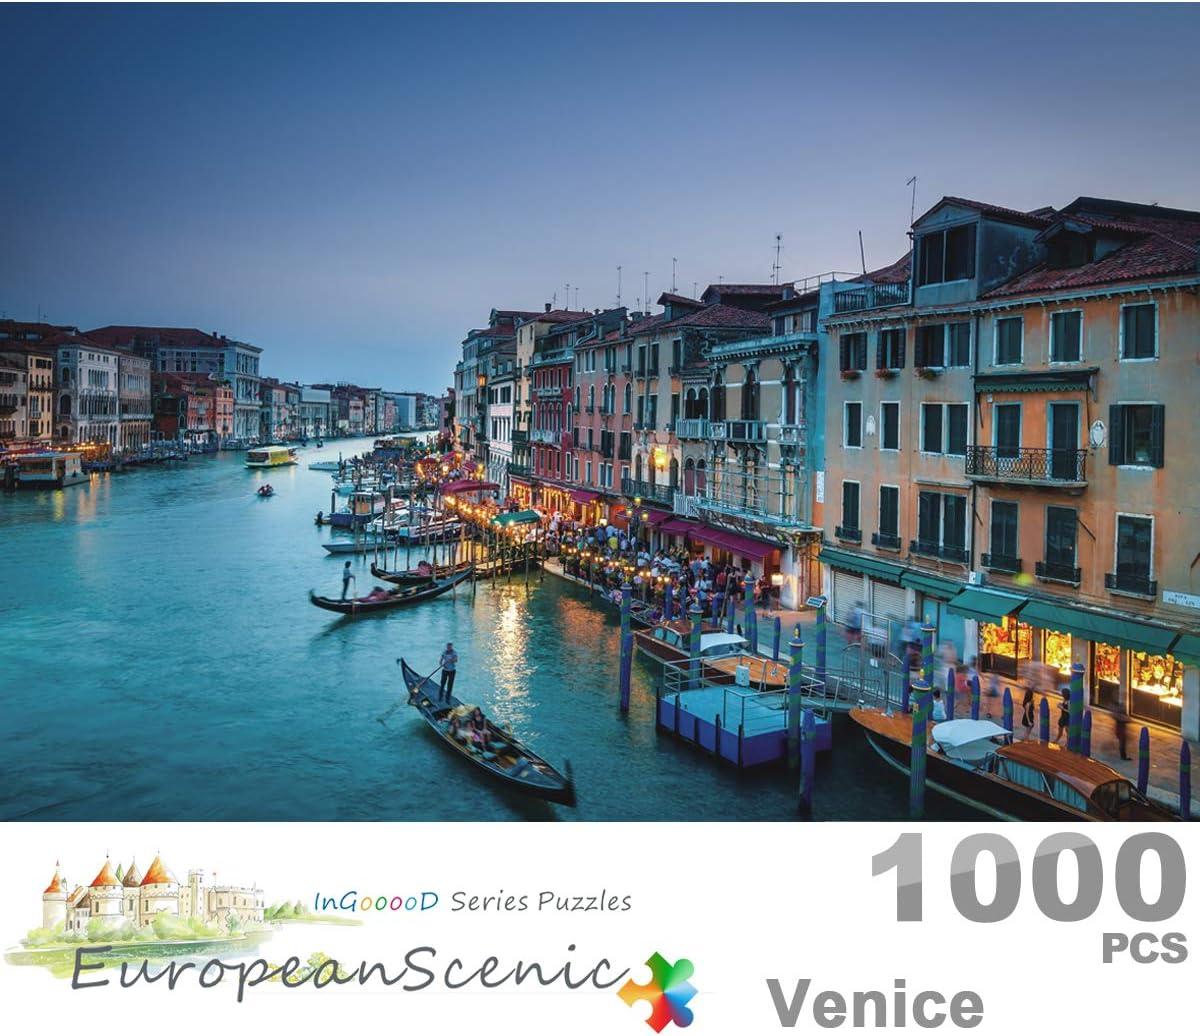 Ingooood Positano European Scenic Series Jigsaw Puzzle 1000 Pieces for Adult Wooden Toy Graduation